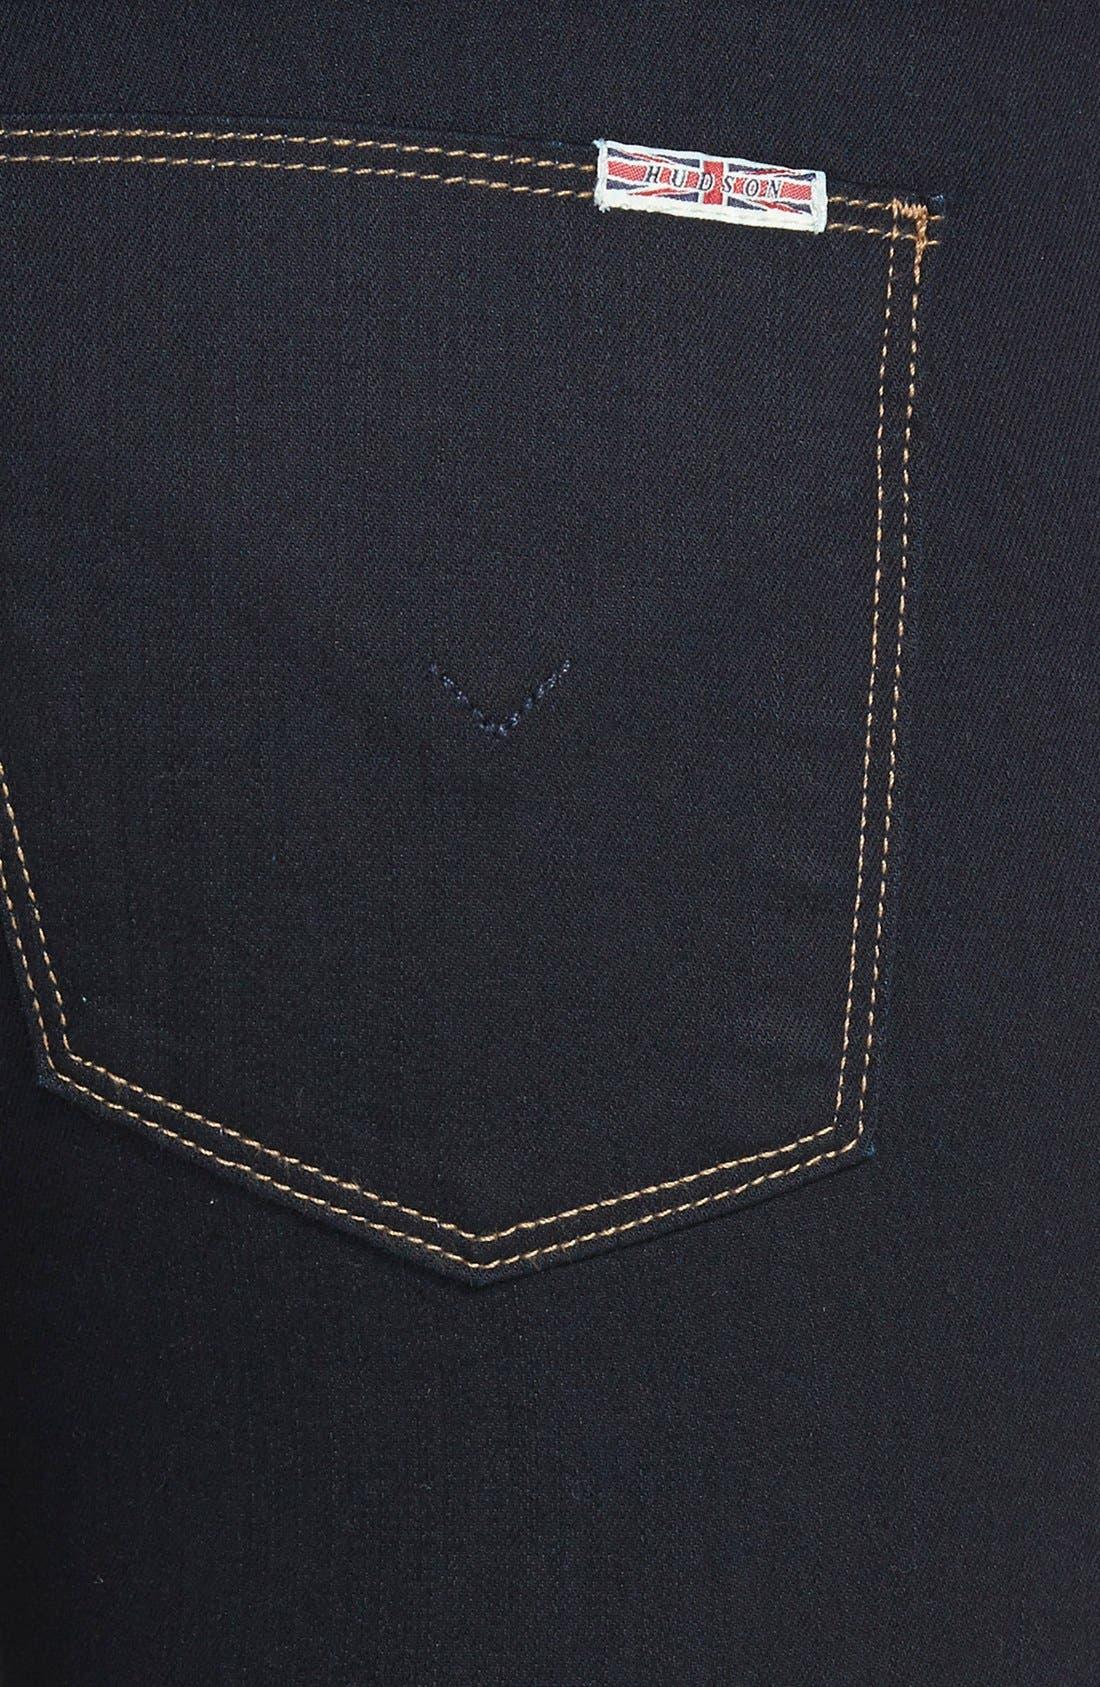 Alternate Image 3  - Hudson Jeans 'Tilda' Mid Rise Straight Leg Jeans (Storm)